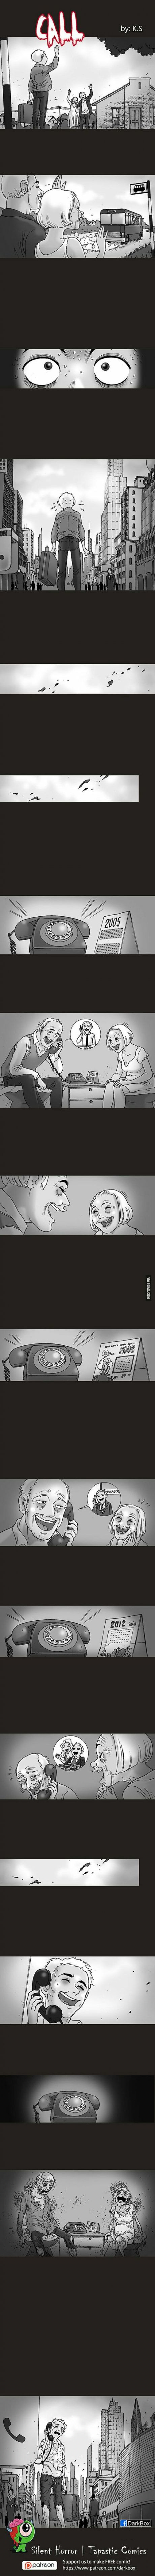 Silent Horror - Call